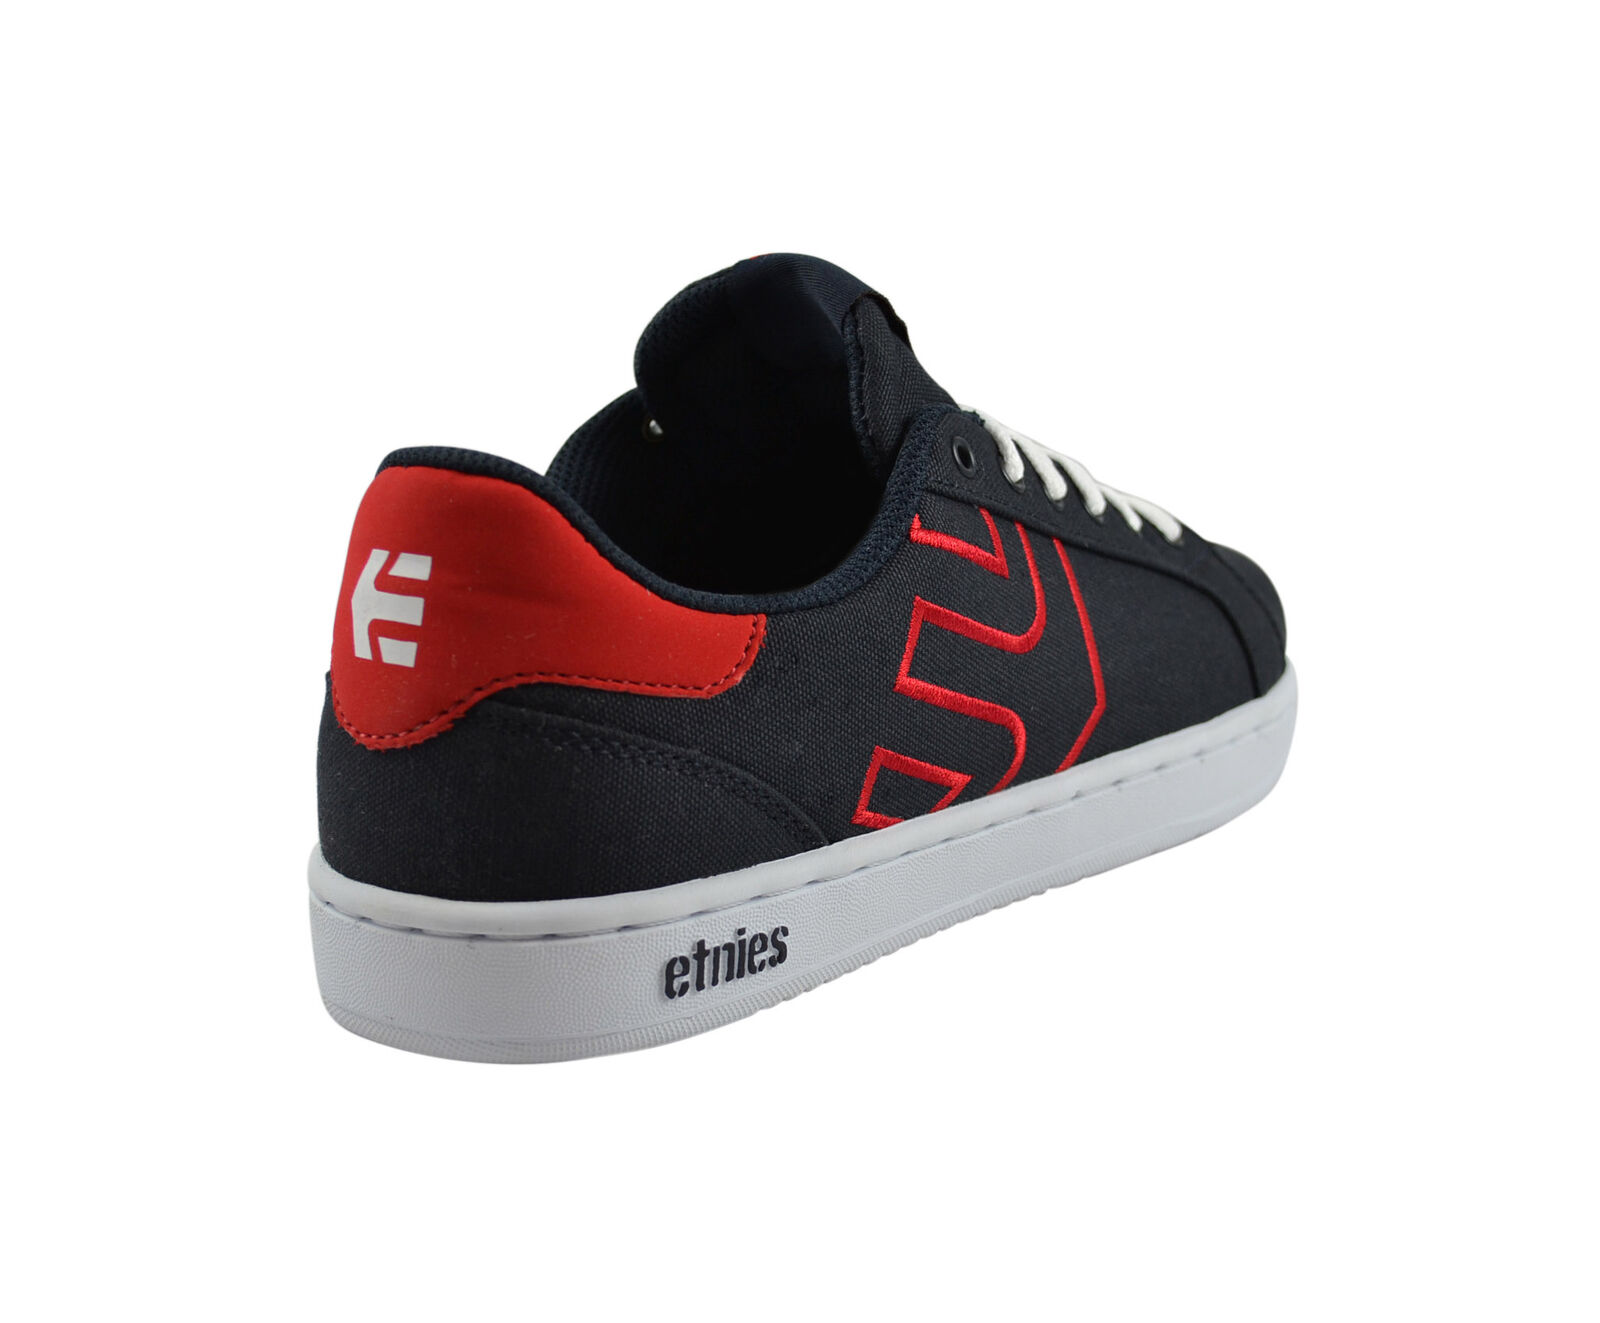 Etnies Fader LS navy rot Weiß Skater blau rot Schuhe Schuhe Schuhe Turnschuhe blau 0fbf1a